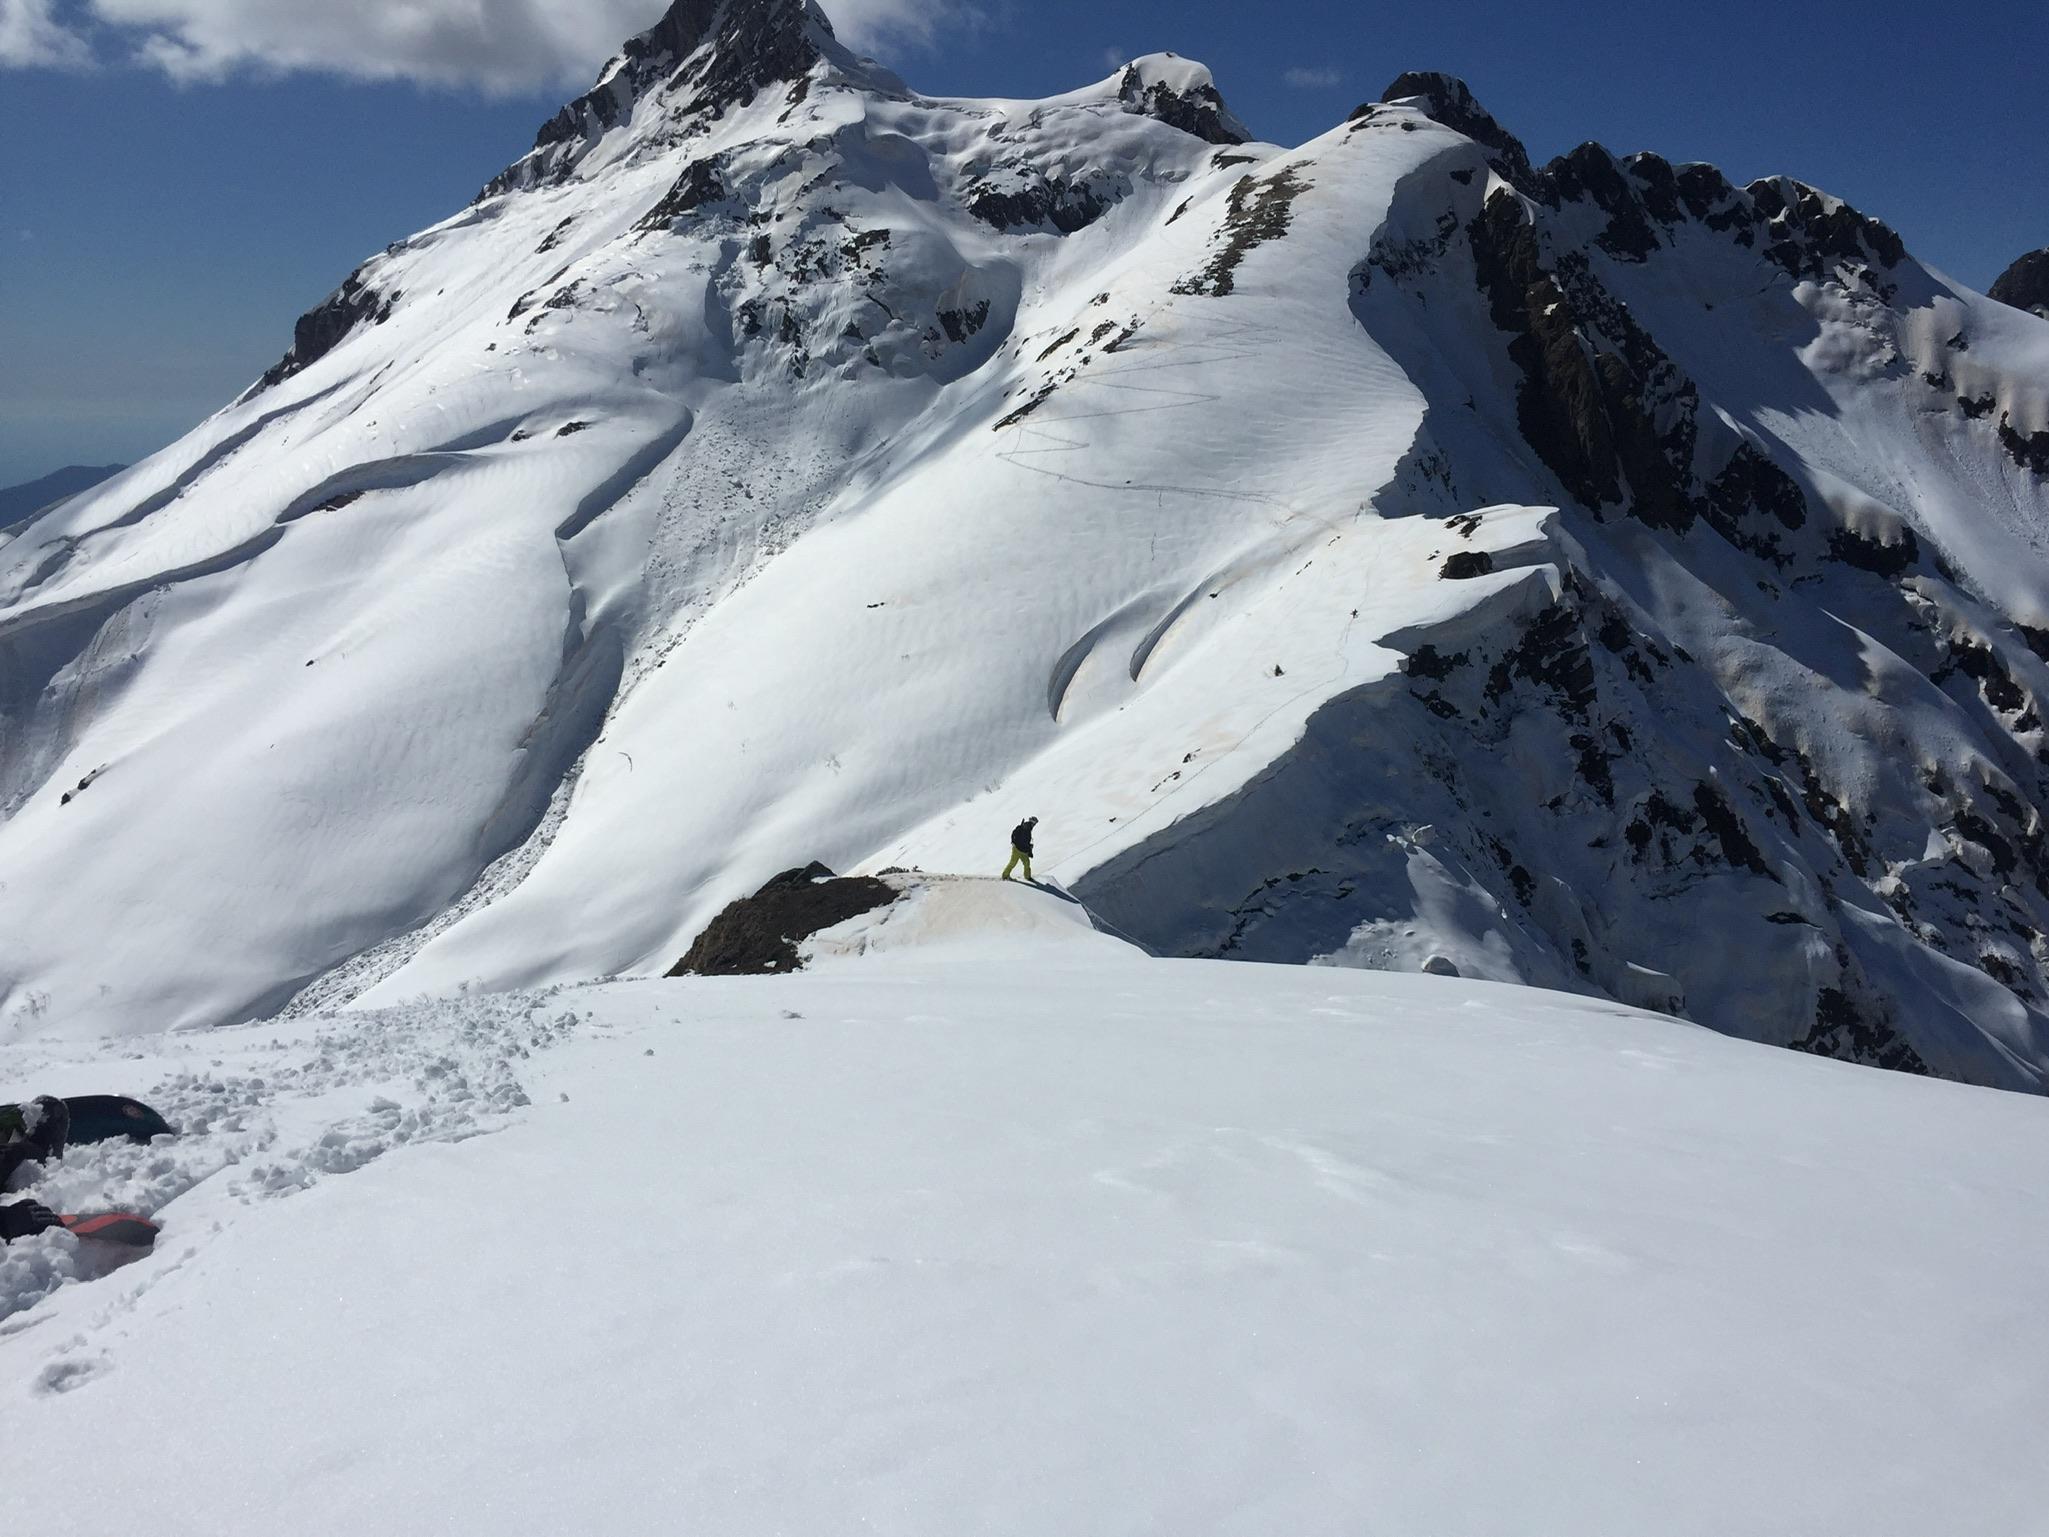 Before some juicy drop, Альпика